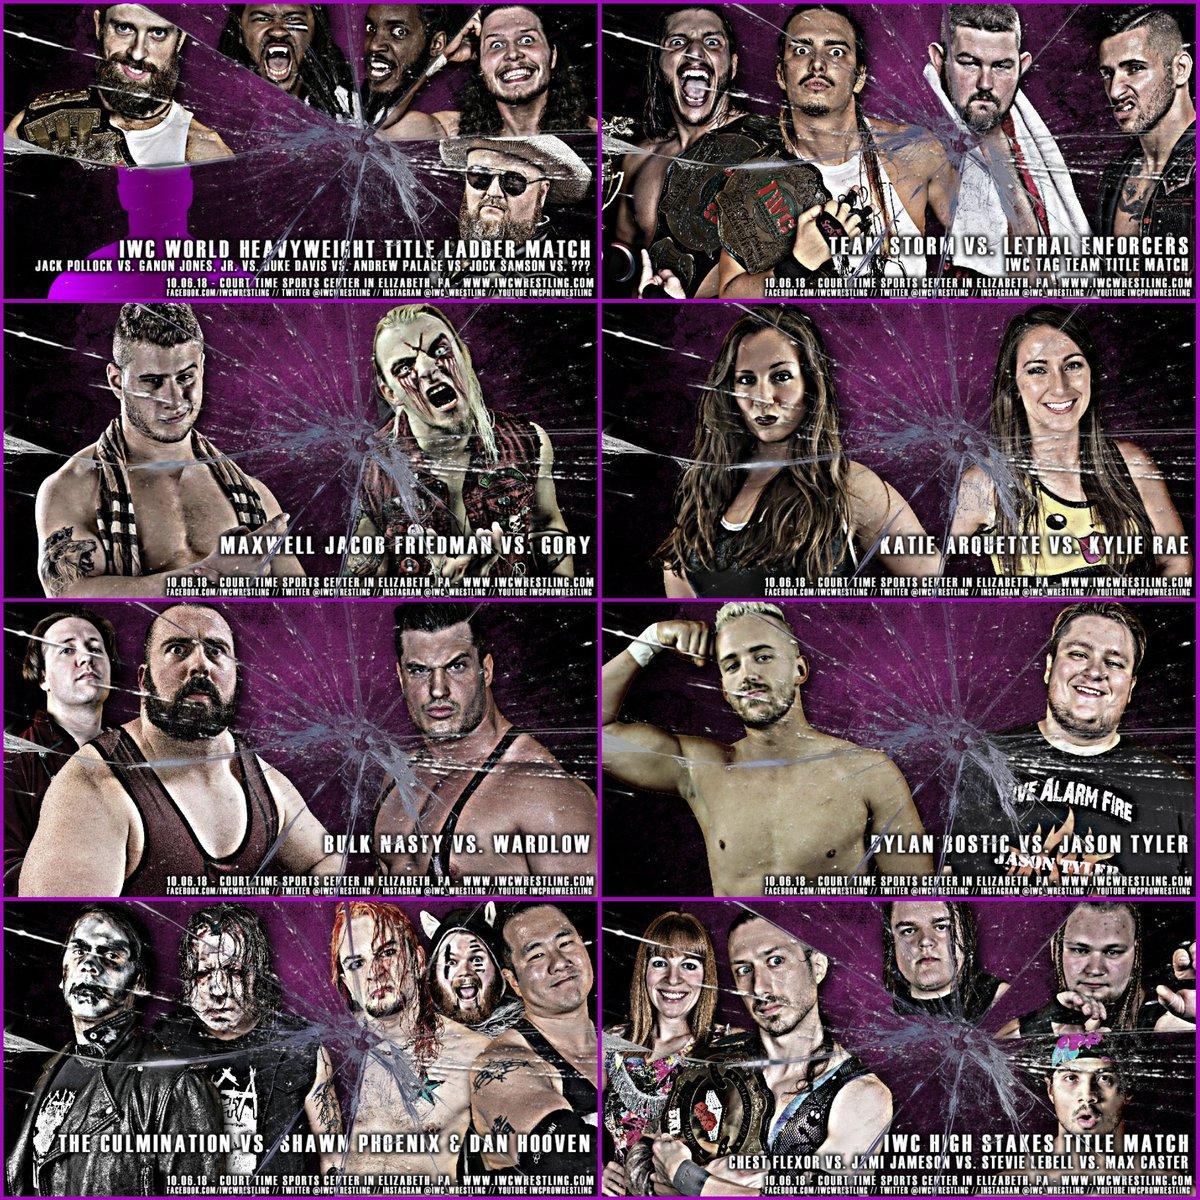 IWC Wrestling on Twitter: